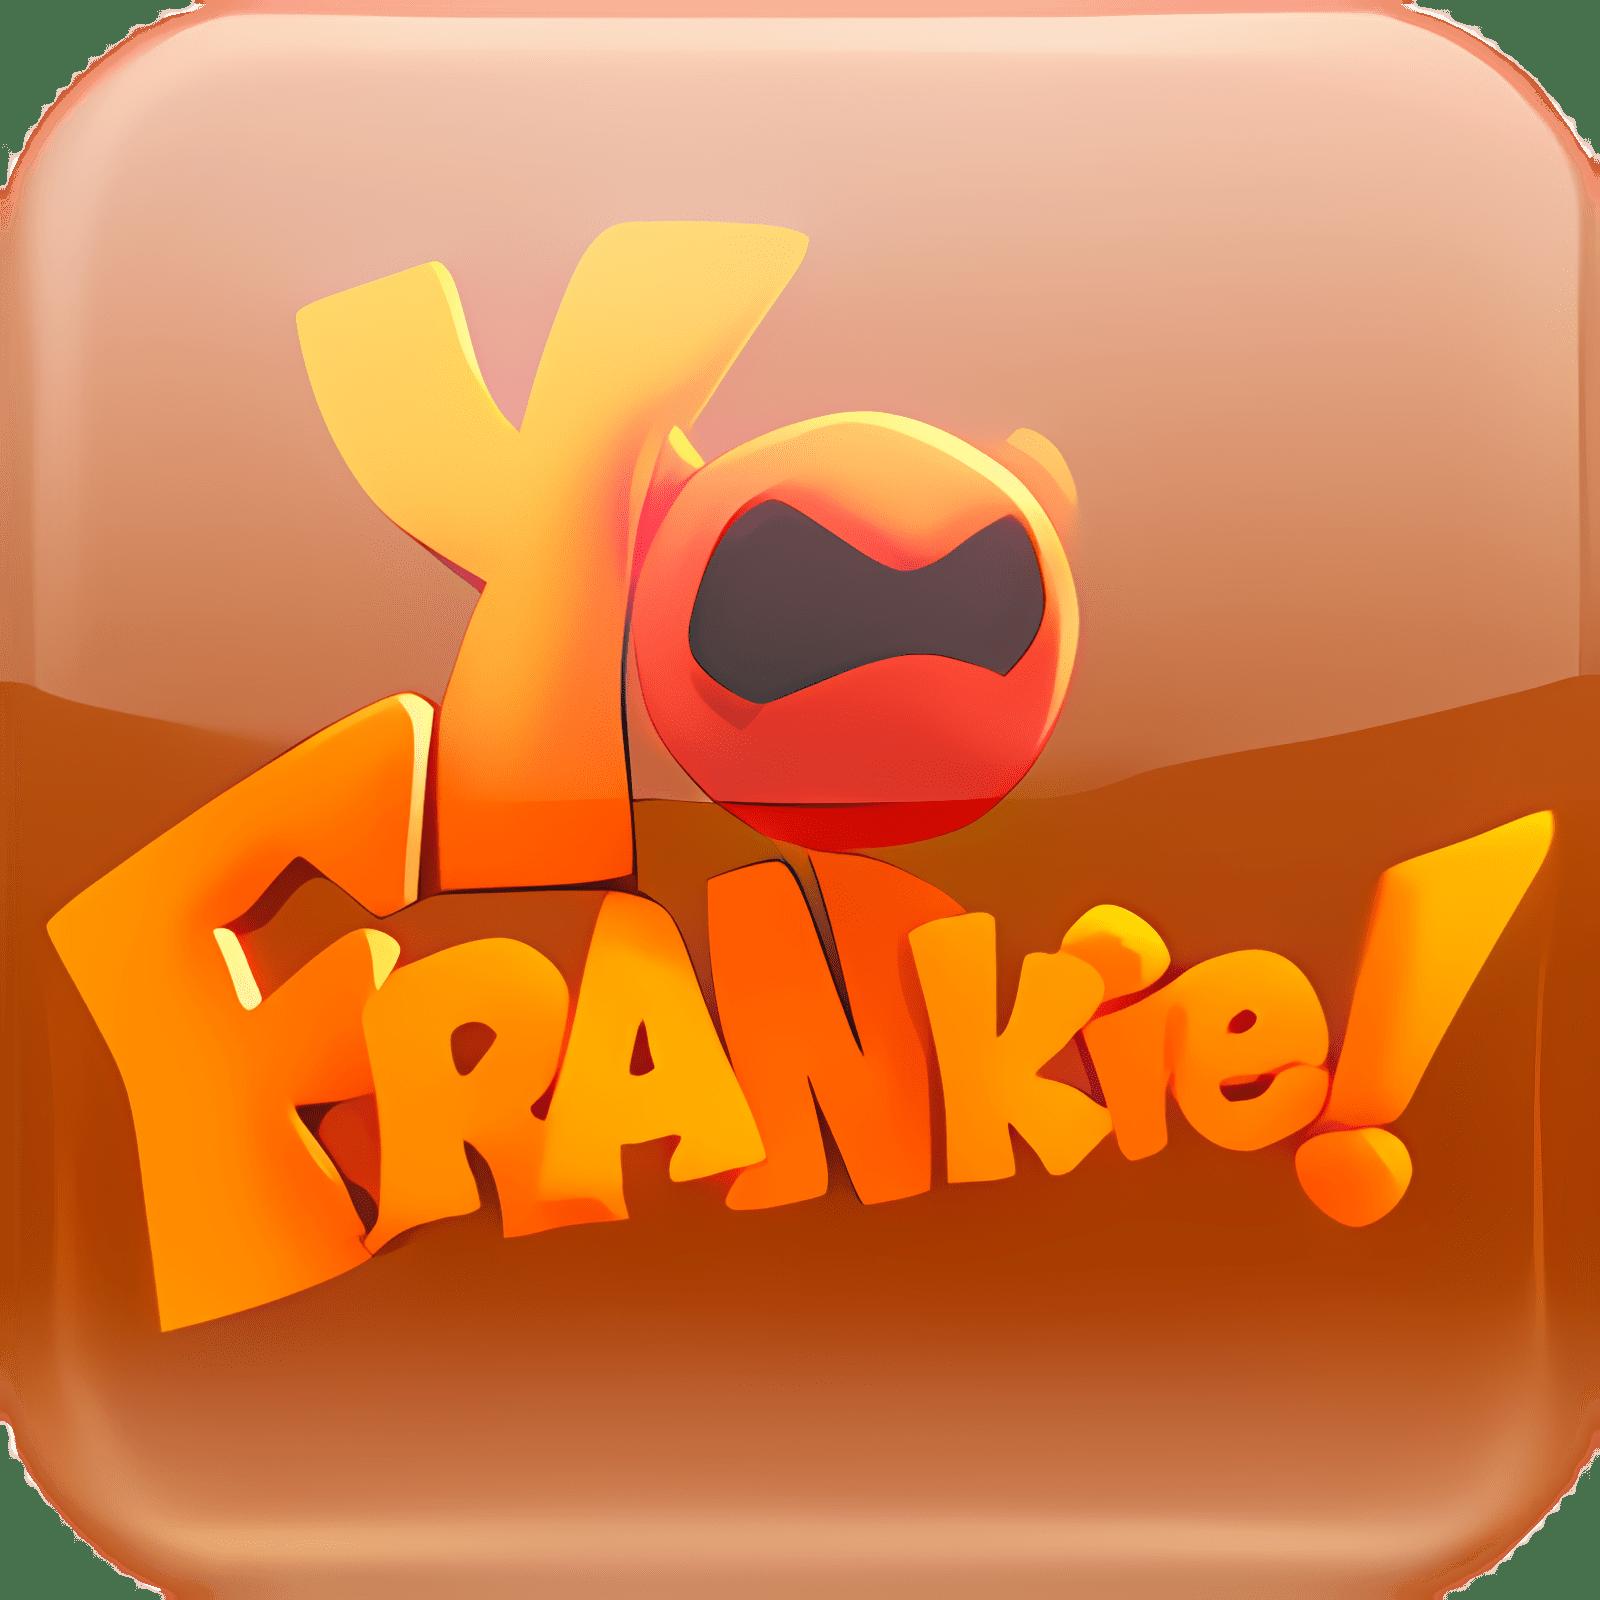 Yo Frankie!